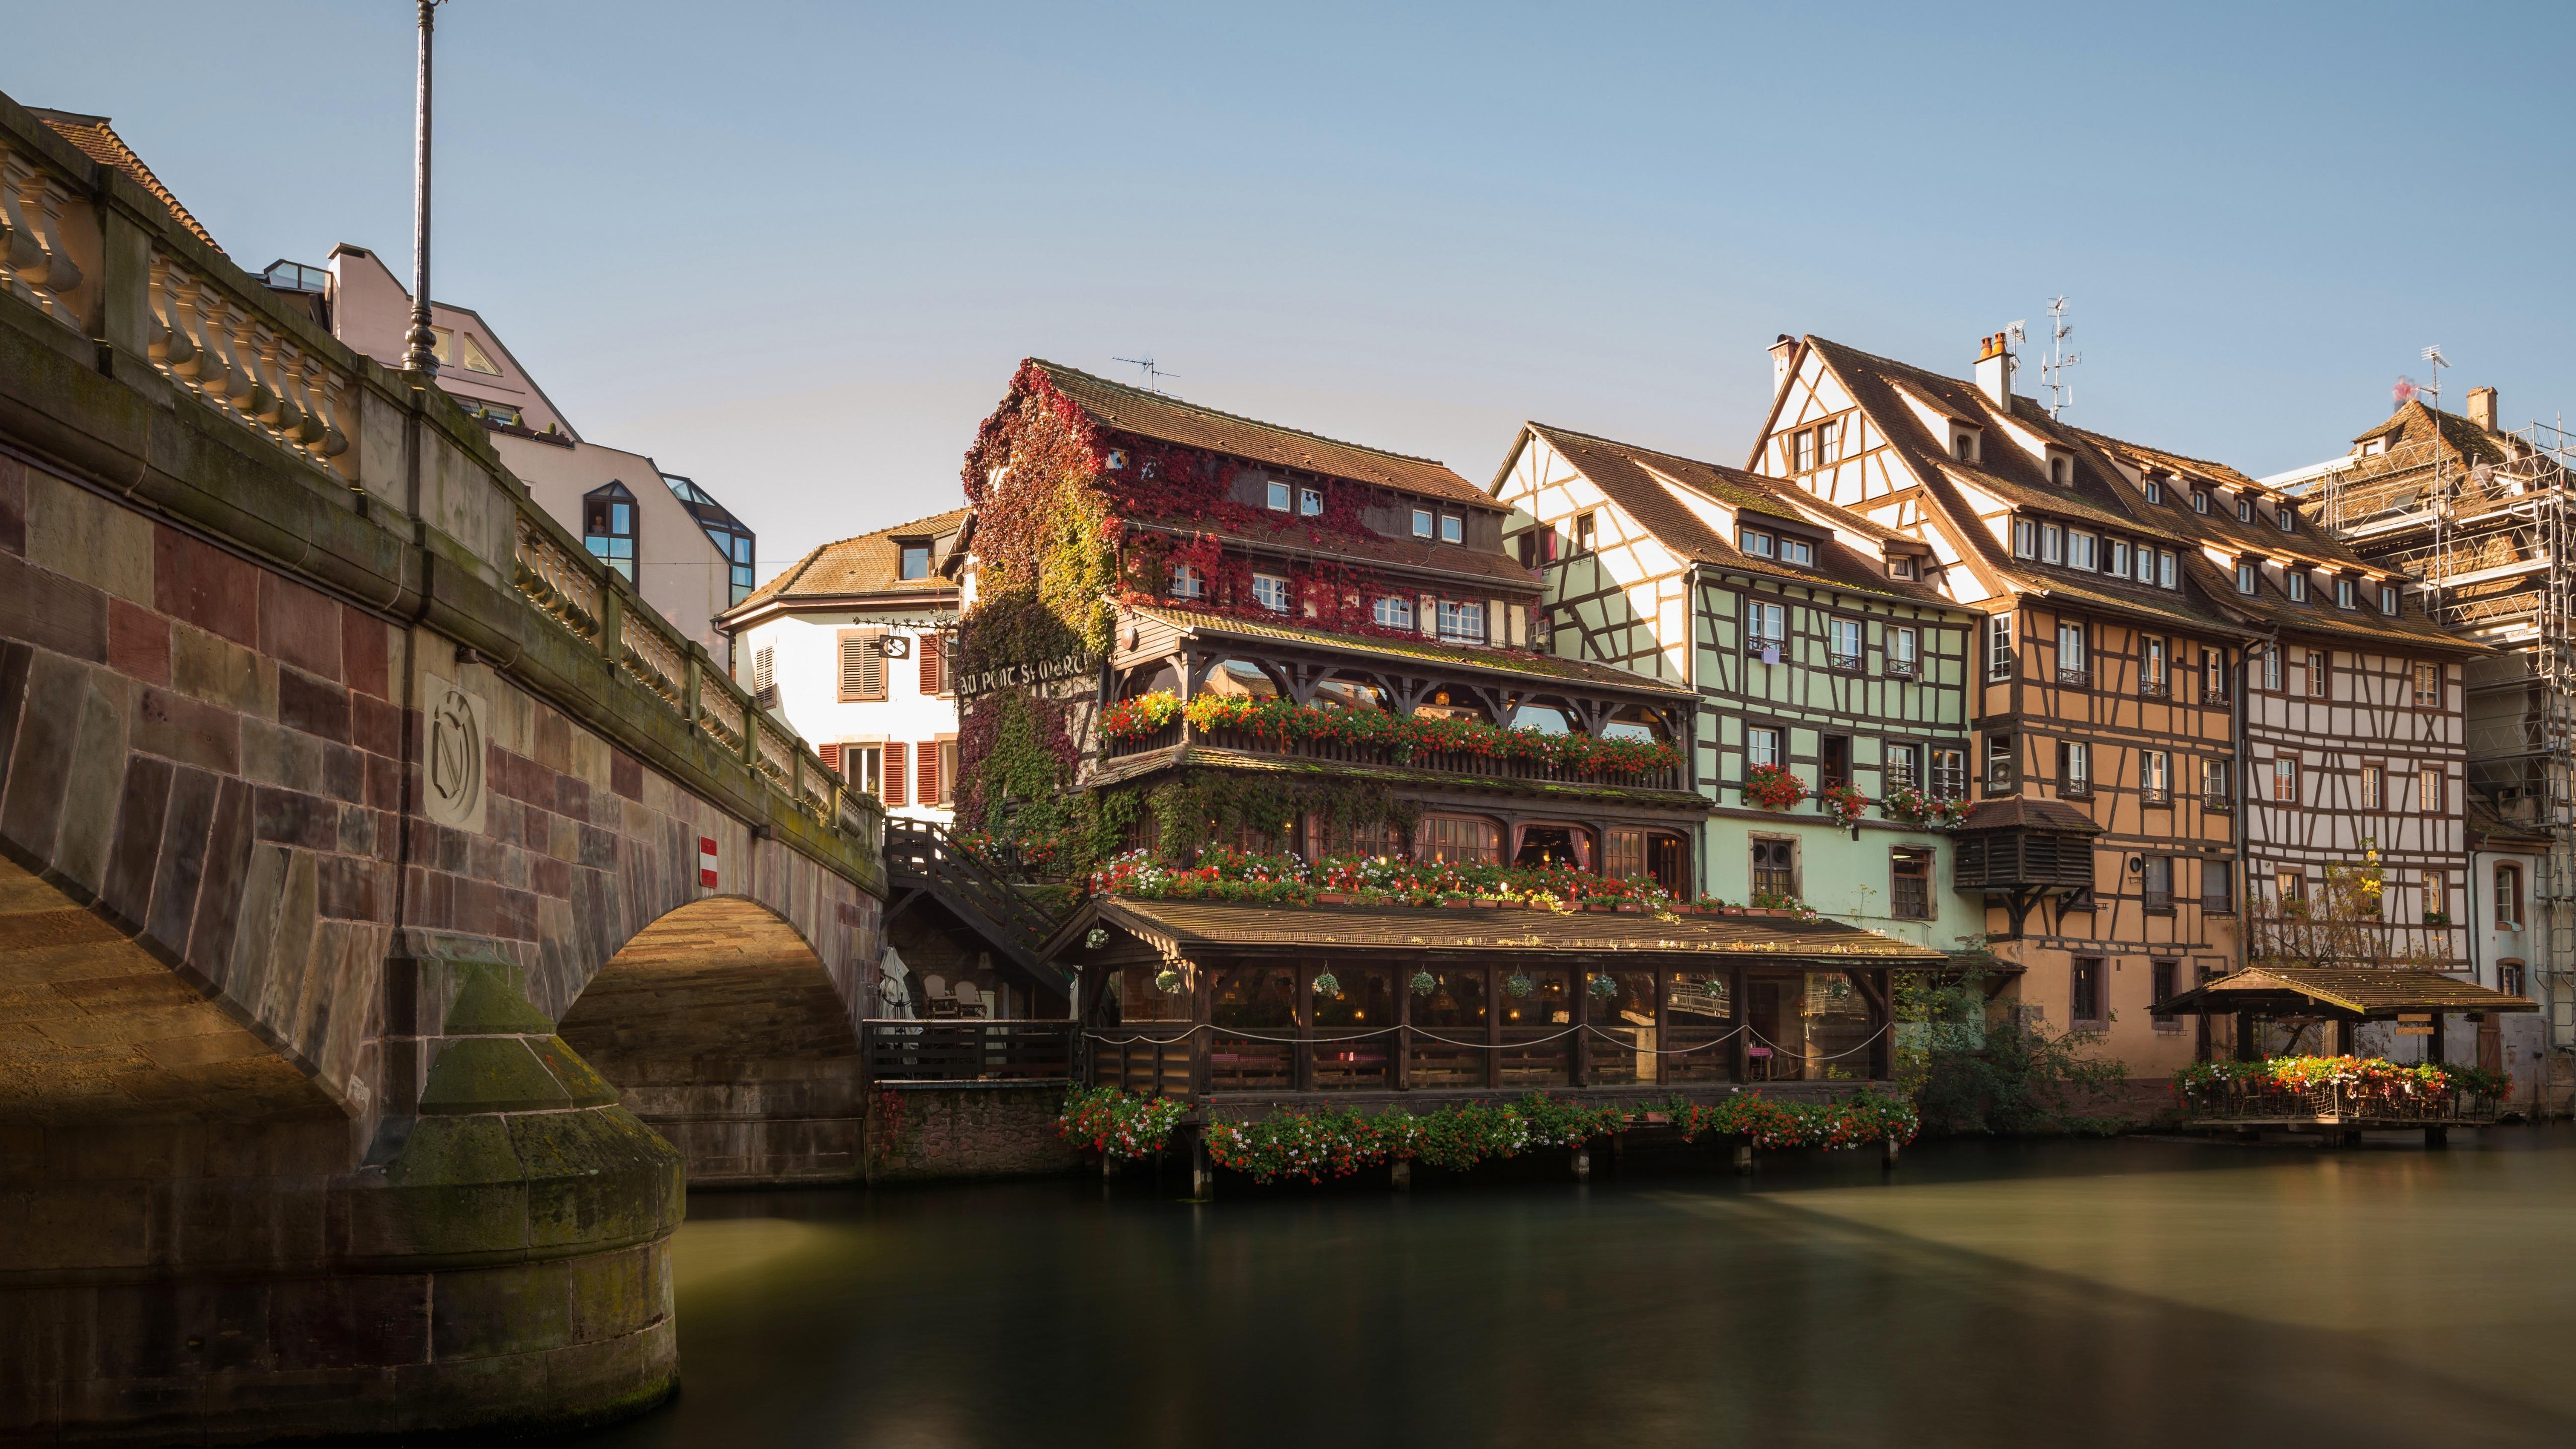 Half-timbered Houses of Strasbourg wallpaper